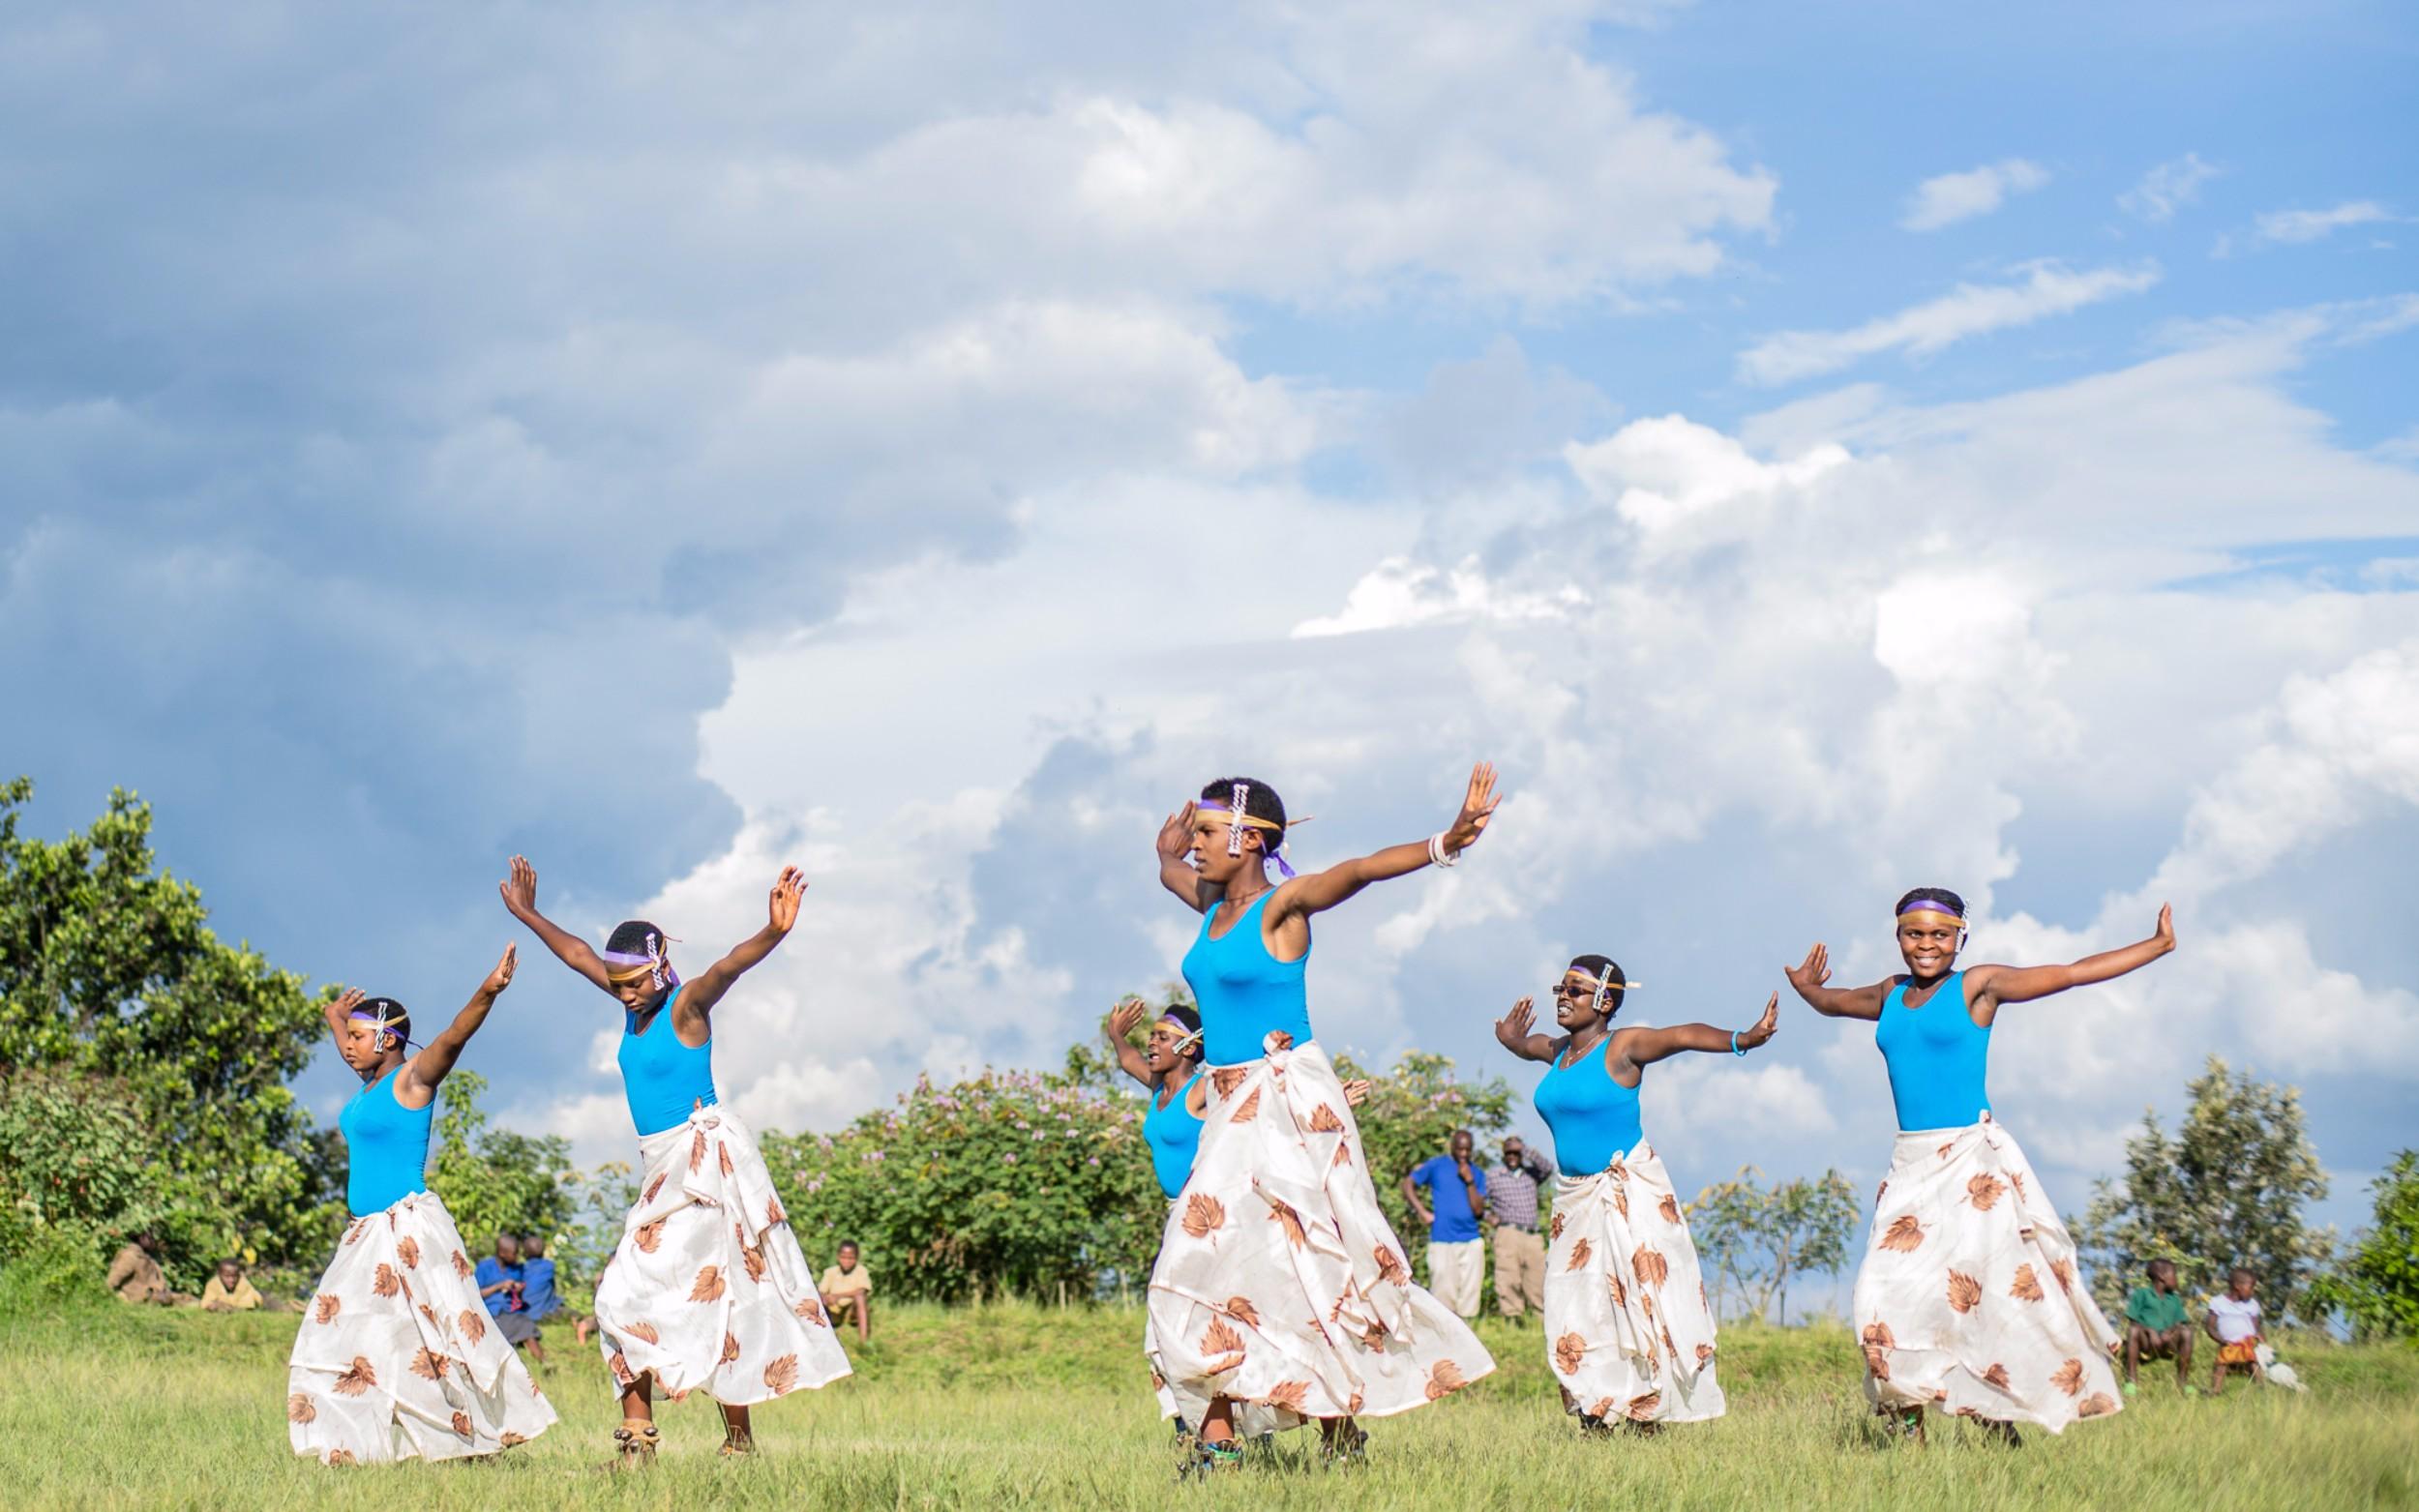 Virunga_intore dancers (female).jpg